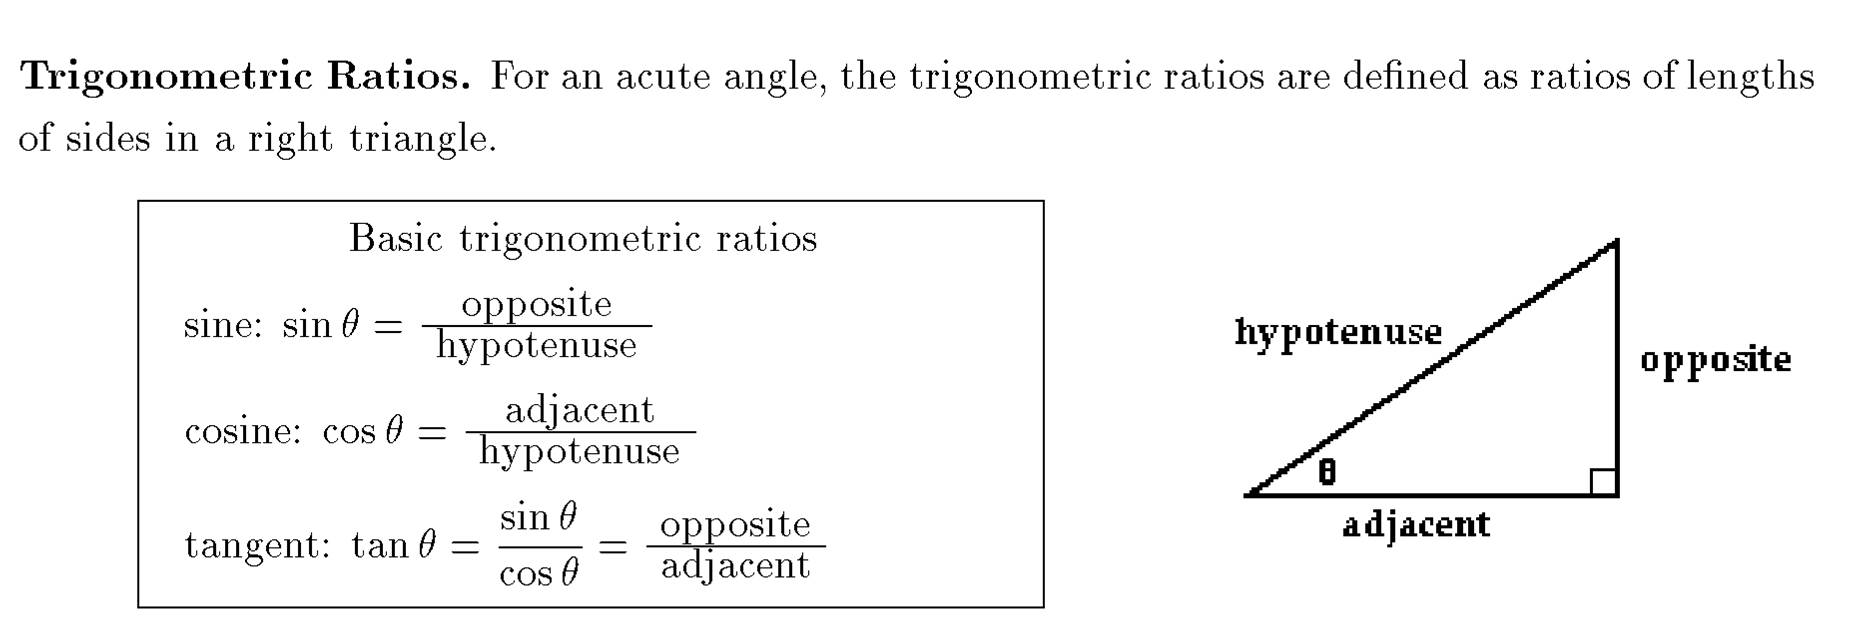 Uncategorized Trigonometric Ratios Worksheet worksheet trigonometric ratios duliziyou worksheets for trig mile2herald omg news and info ratios